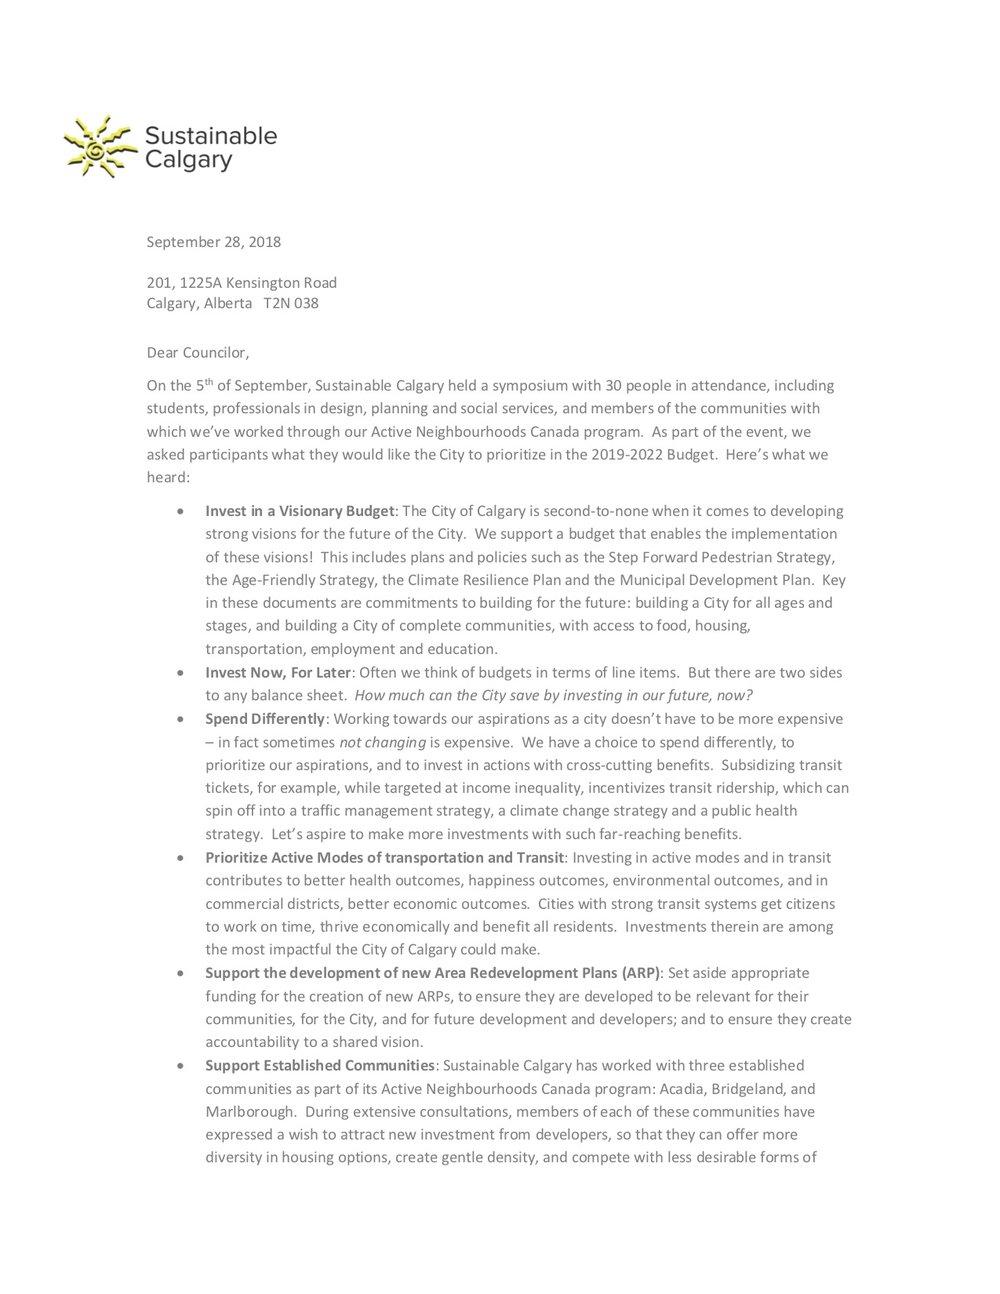 Sustainable Calgary - September 2018 Budget Consultation .jpg